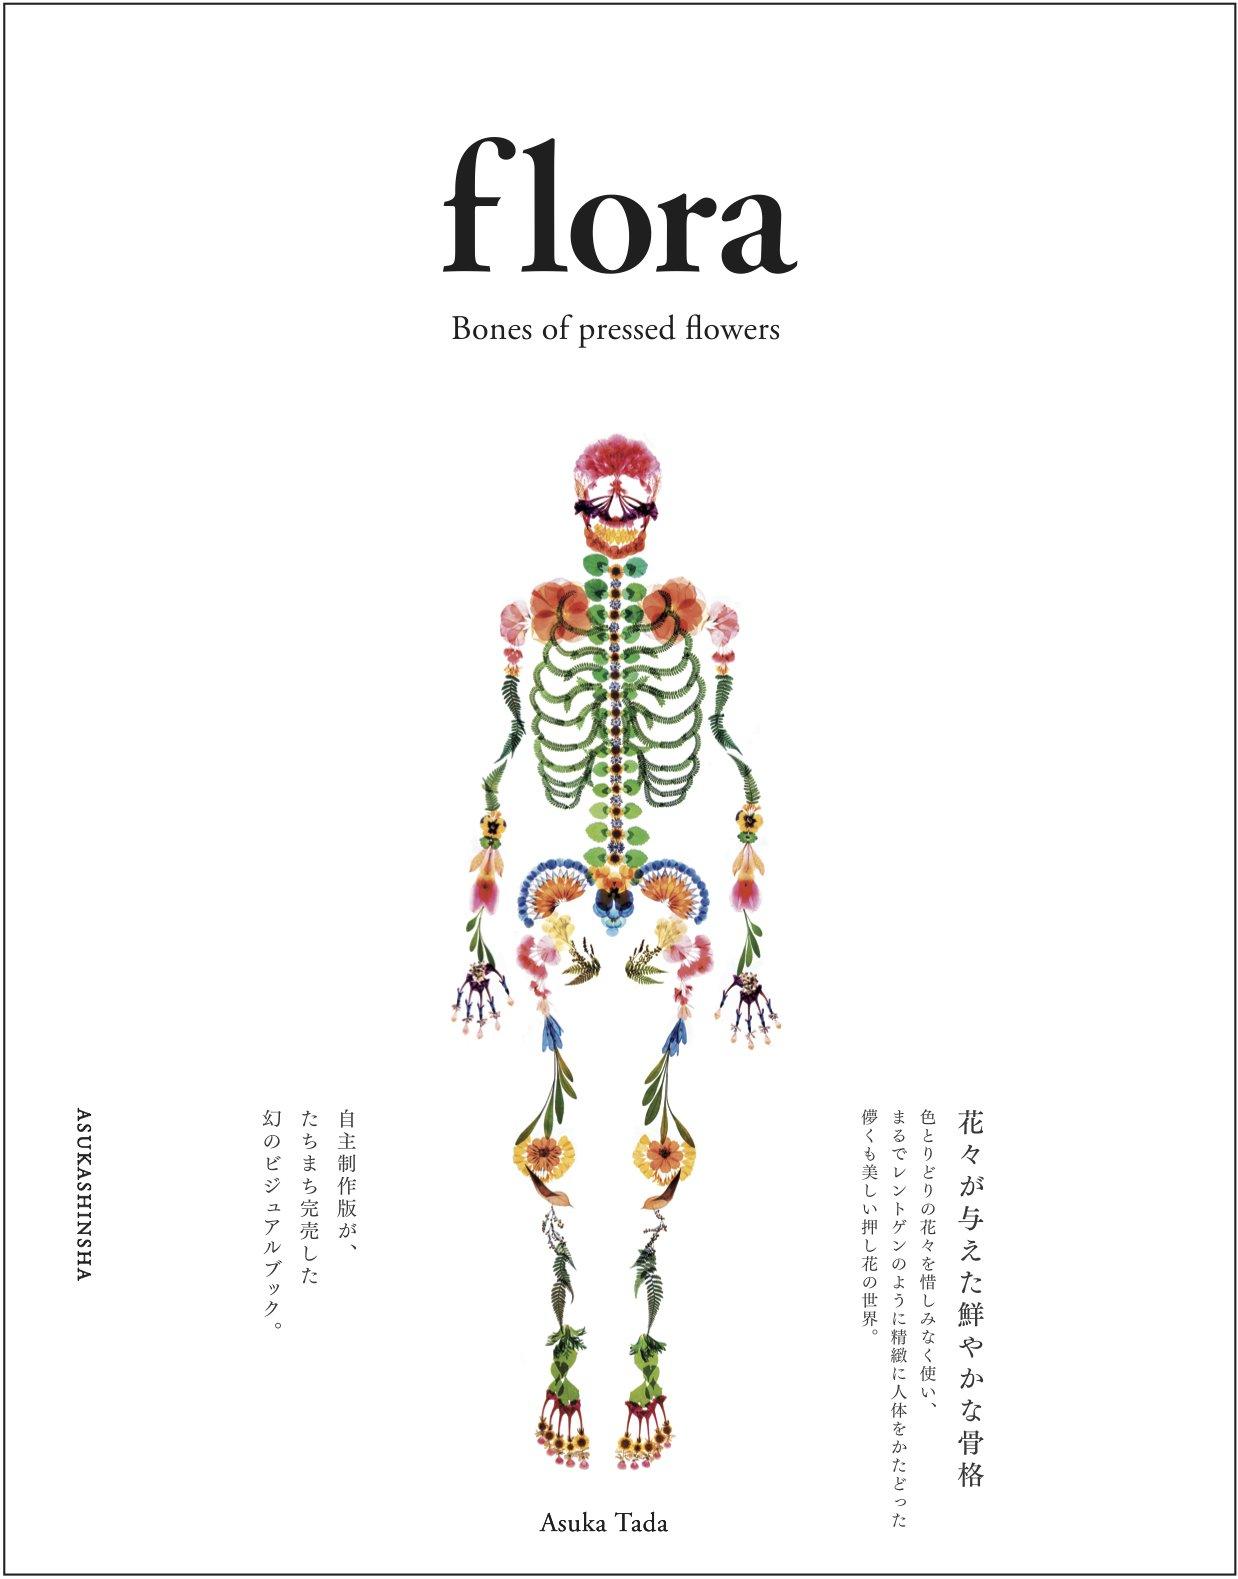 Art Book Flora Bones Of Pressed Flowers Amazon Asuka Tada